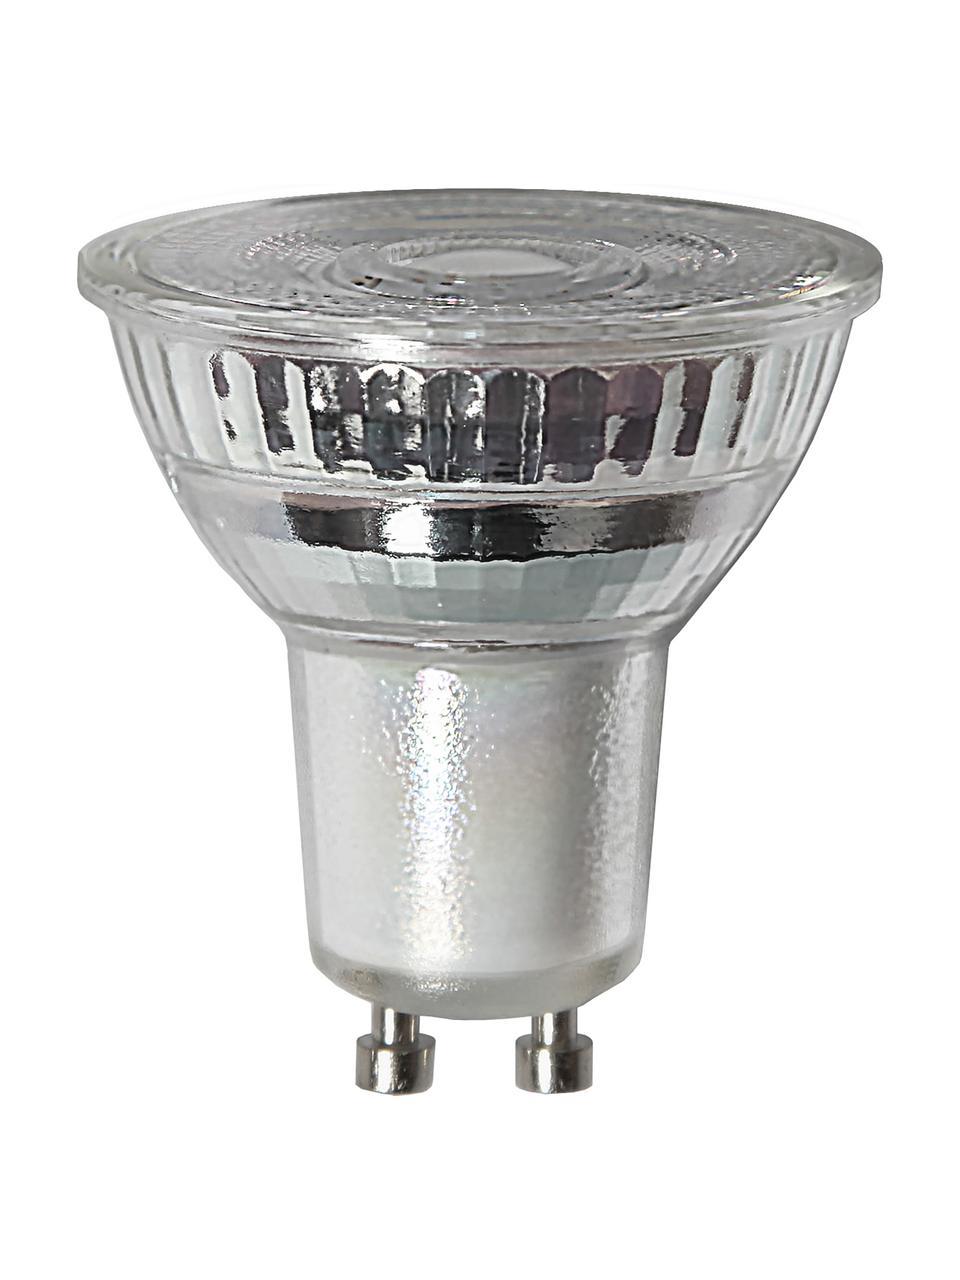 GU10 Leuchtmittel, 4.5W, dimmbar, warmweiß, 3 Stück, Leuchtmittelschirm: Glas, Leuchtmittelfassung: Aluminium, Transparent, Ø 5 x H 5 cm